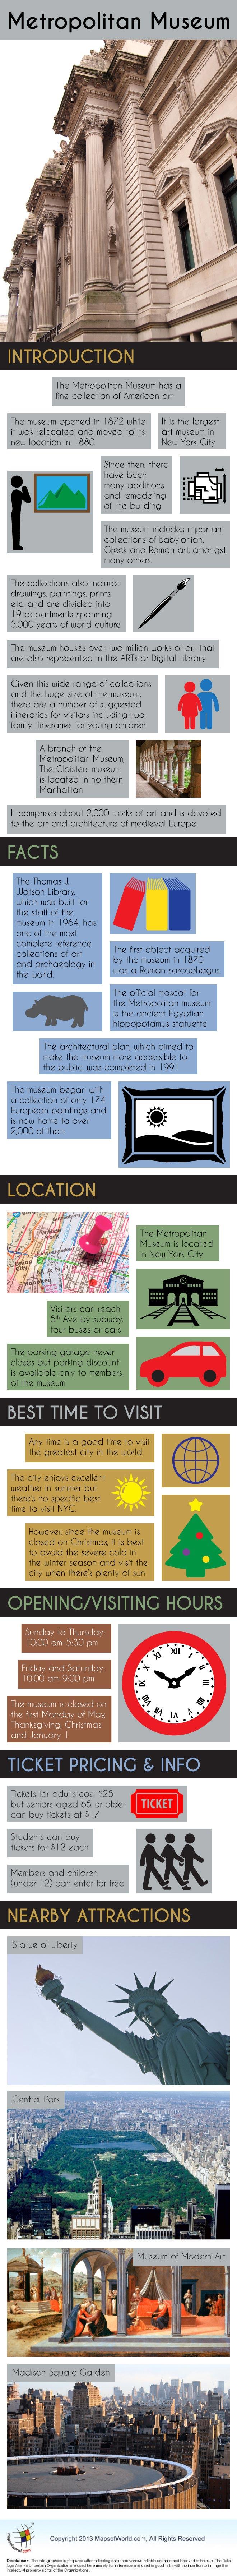 Metropolitan Museum Infographic